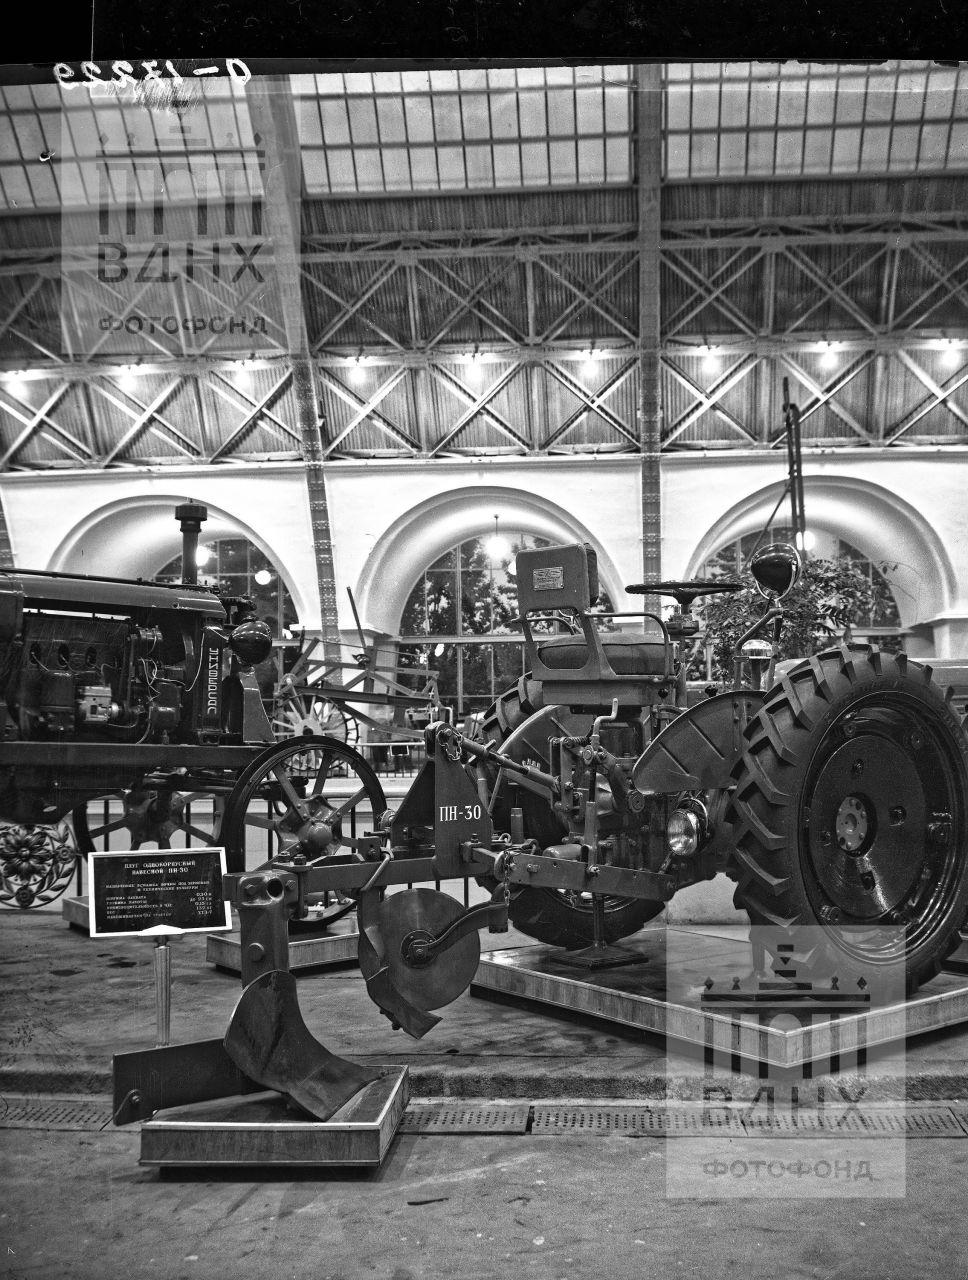 Плуг навесной ПН-30 к трактору ХШЗ-7